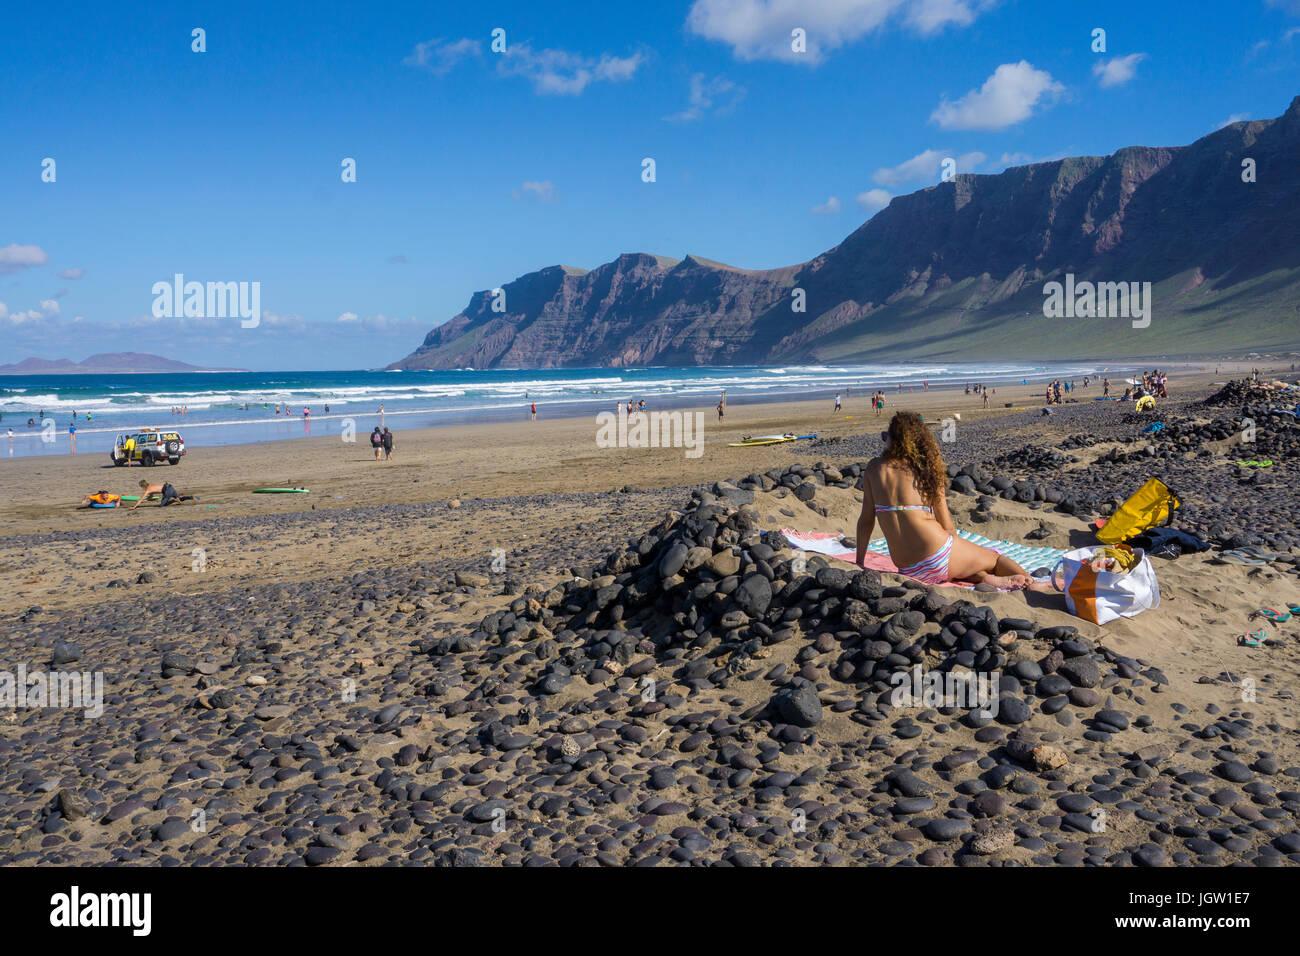 Girl takes a sunbath at Famara beach, Famara mountains, La Caleta de Famara, Lanzarote island, Canary islands, Spain, - Stock Image